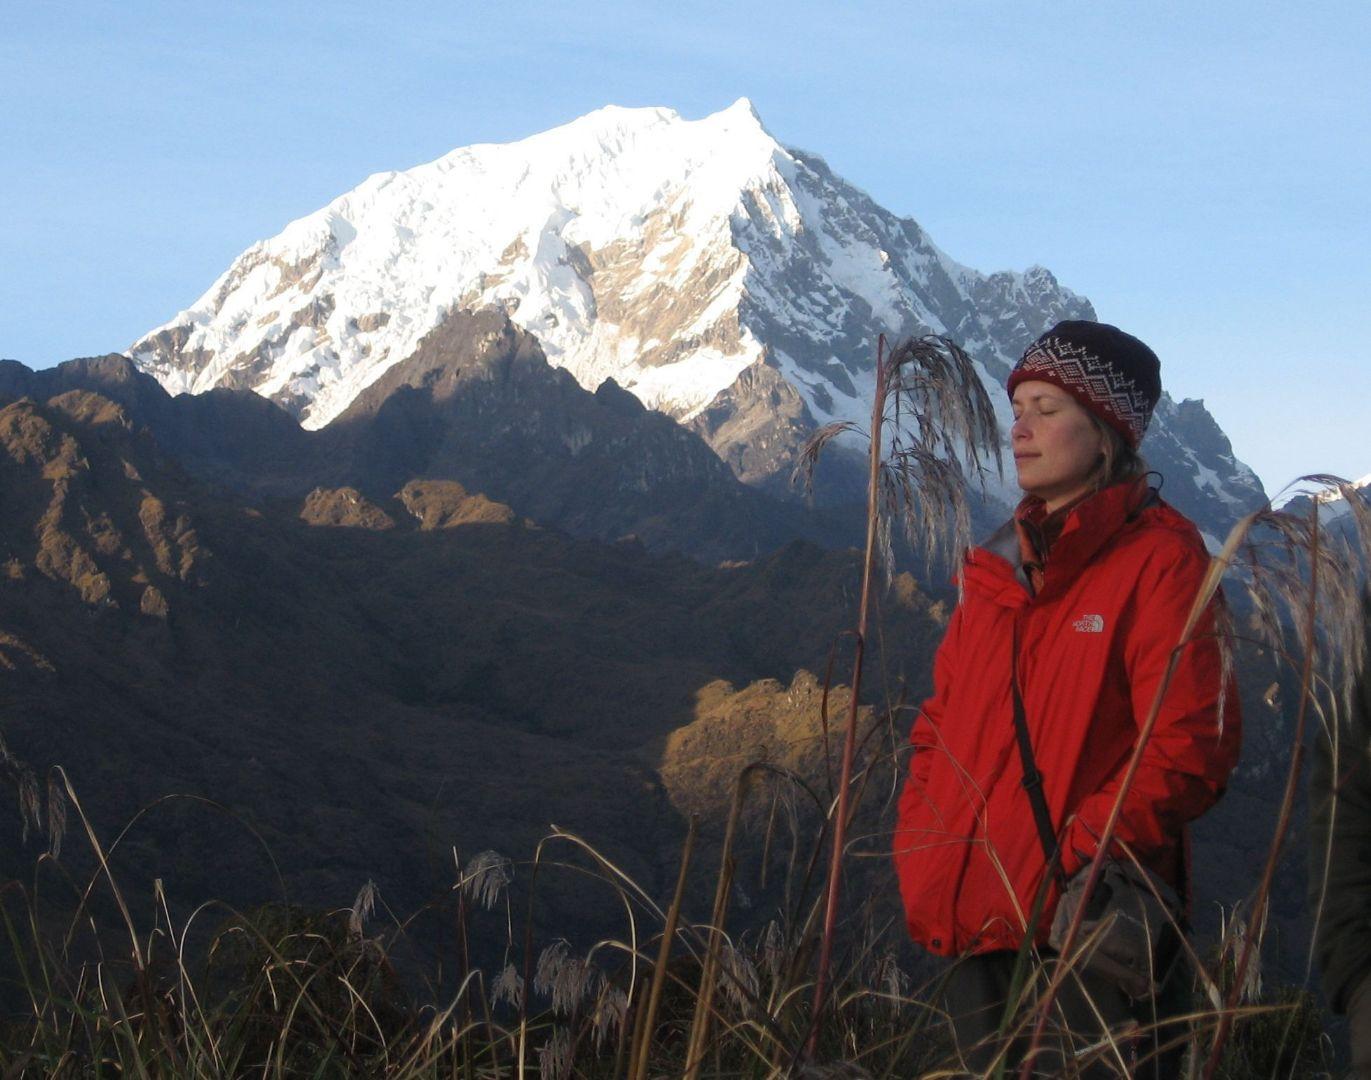 Salcantay sunrise Skedaddle Peru Andes, Amazon and Machu Picchu Biking Holiday.jpg - Peru - Andes, Amazon and Machu Picchu - Cycling Adventures